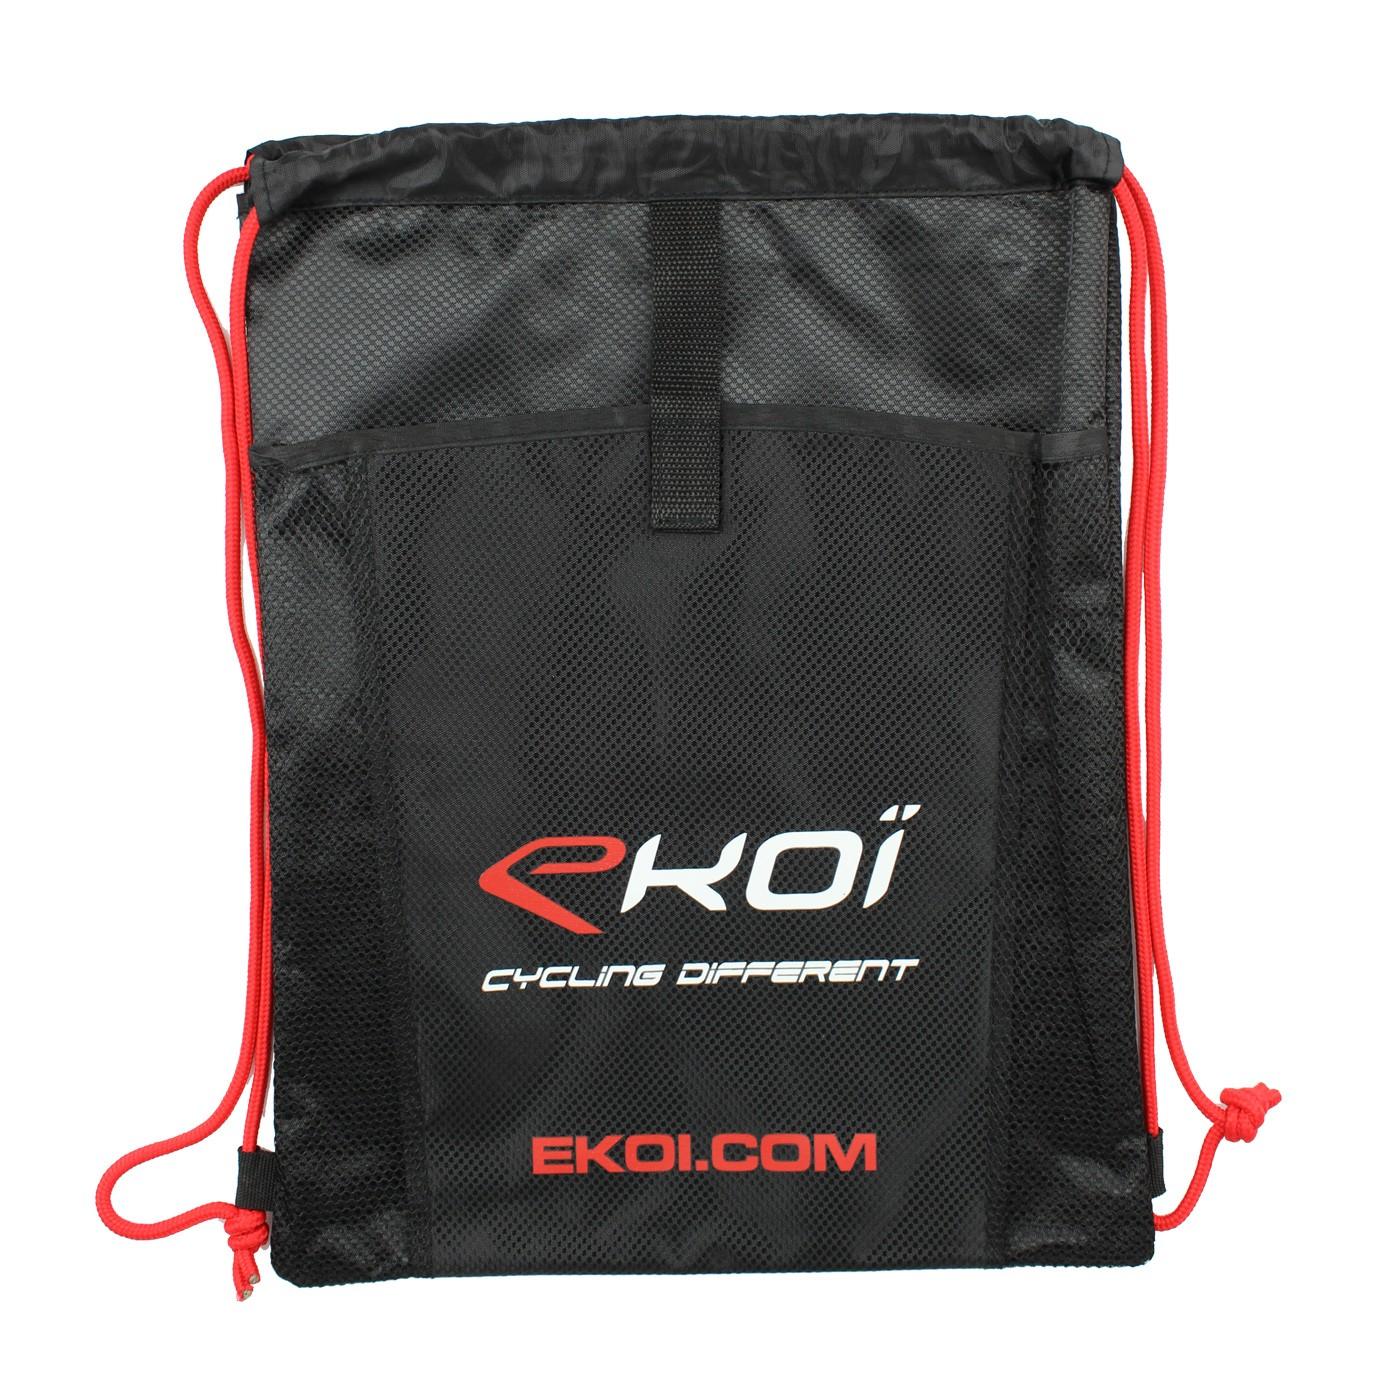 Taske Mini Bag EKOI 2018